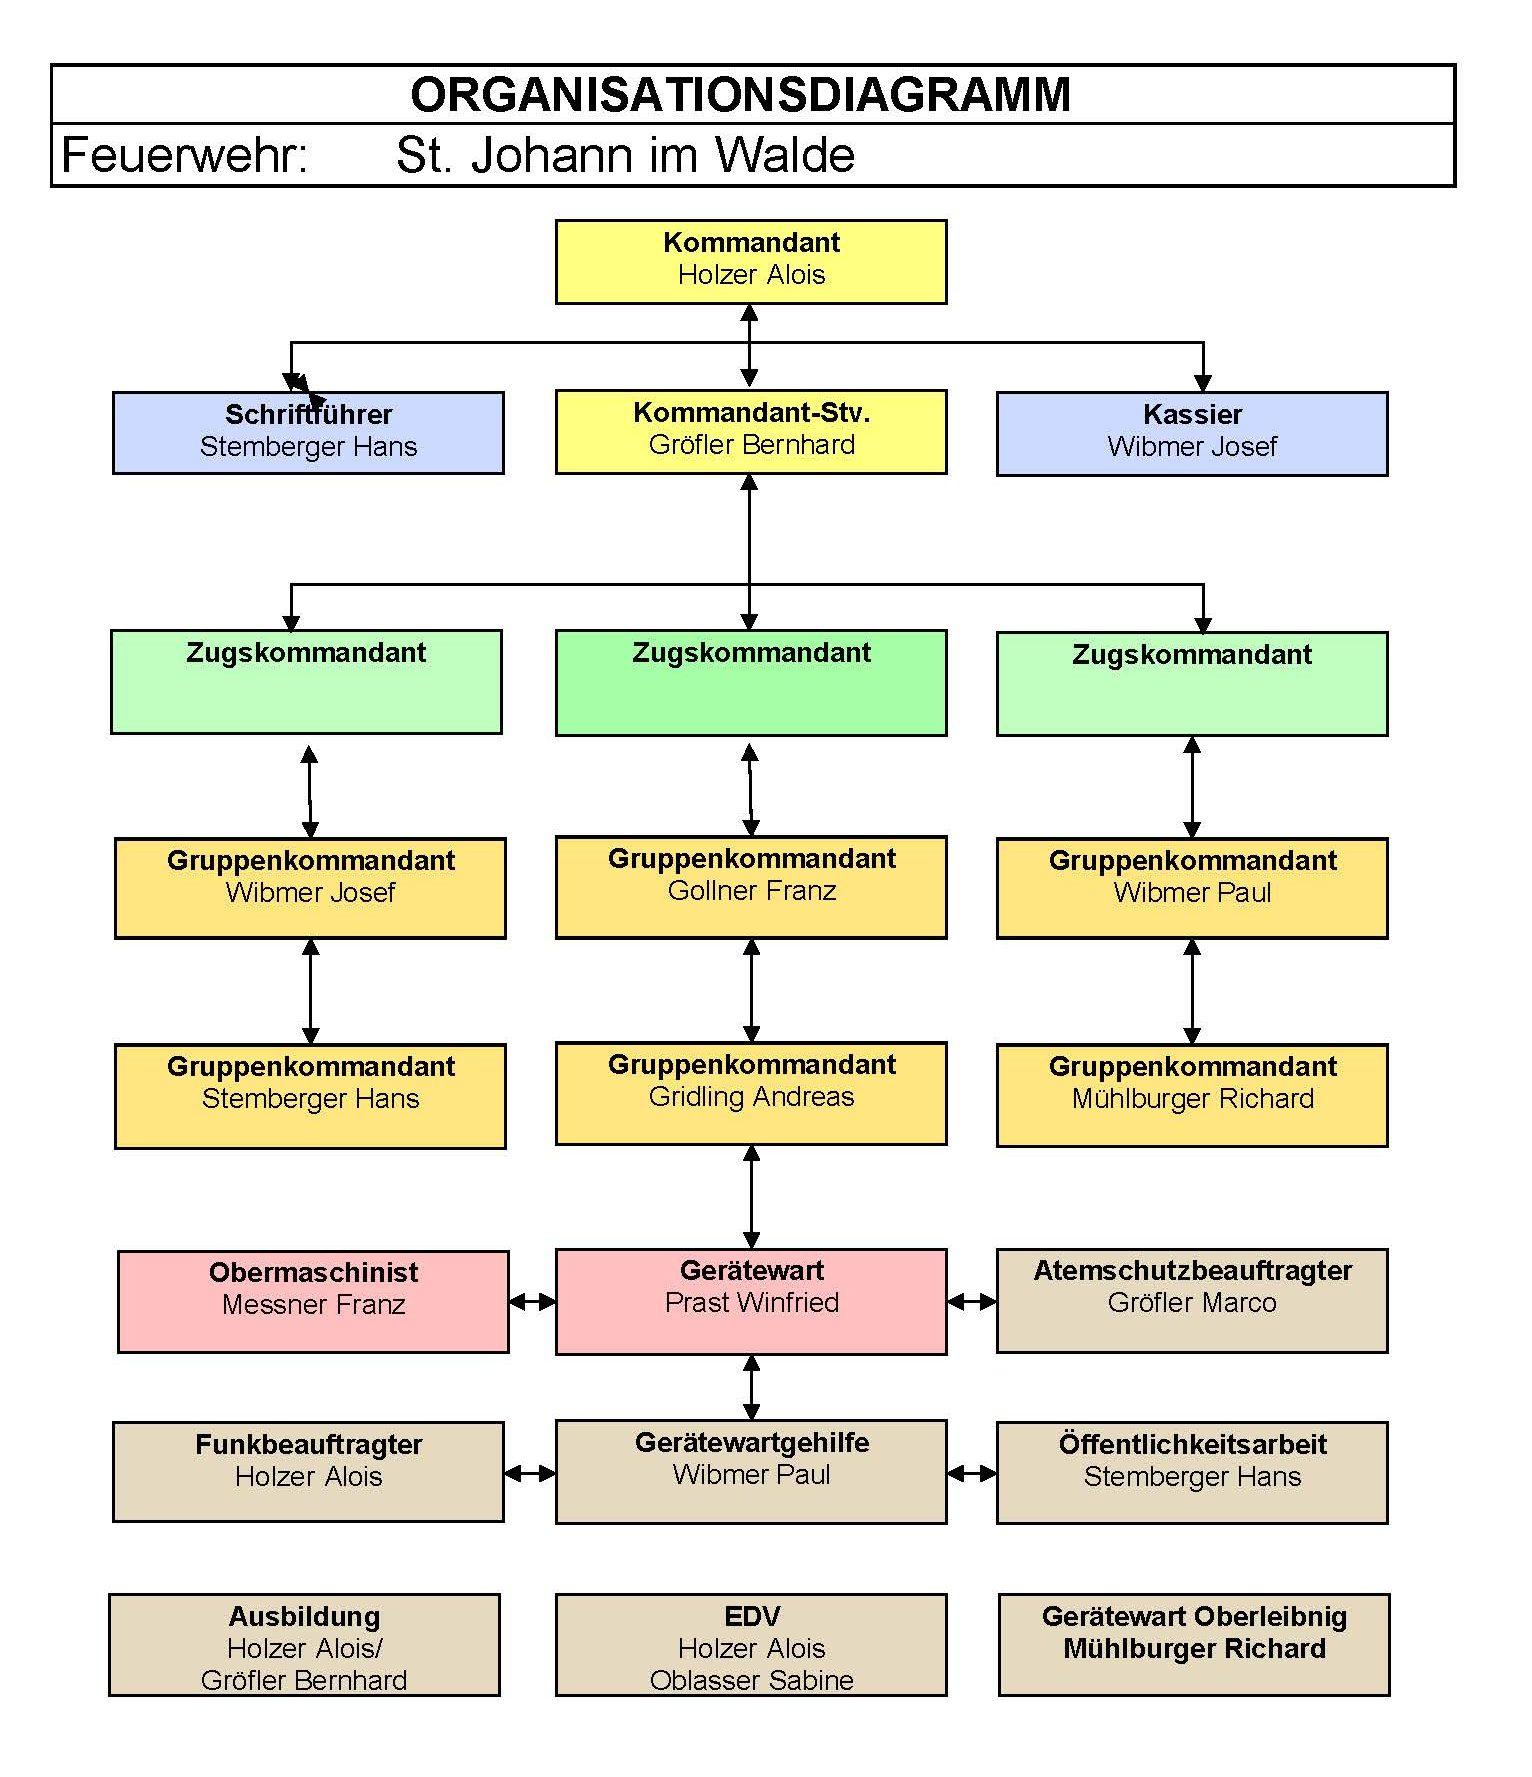 Organisationsdiagram FF St. Johann